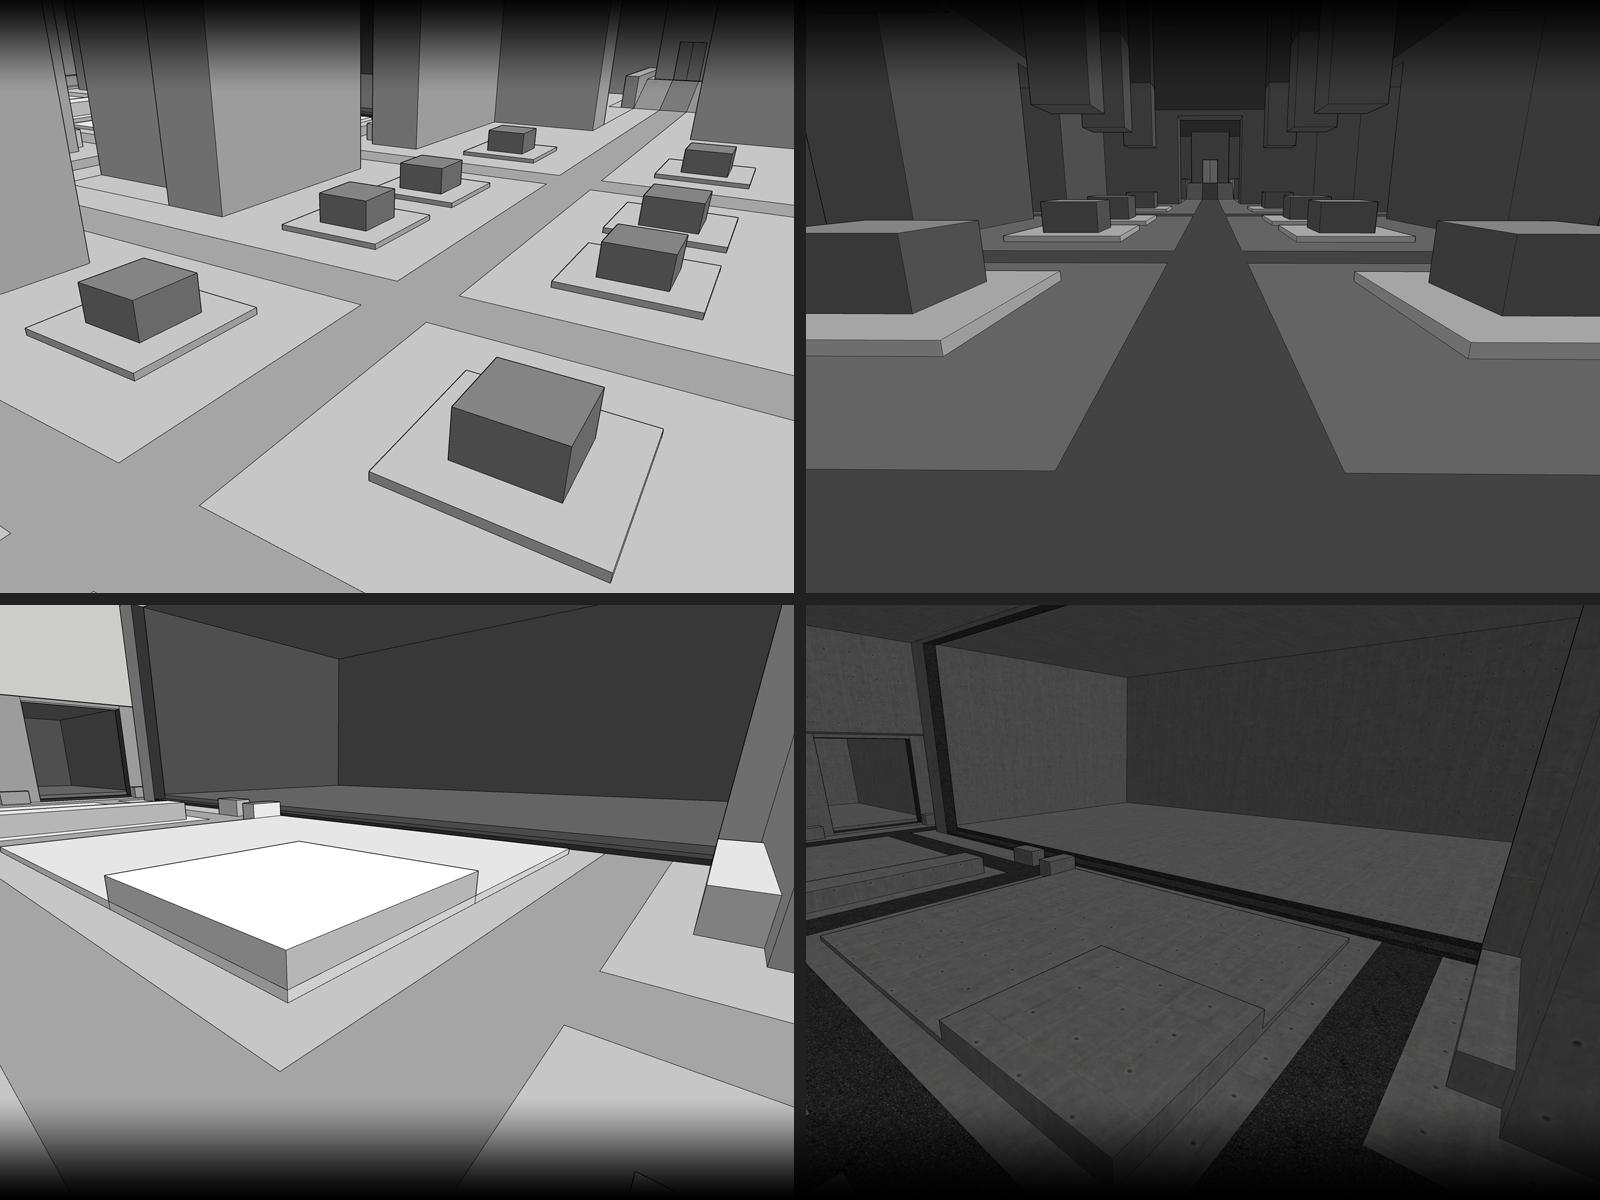 mad-gfx-warehouse-v1-3.jpg